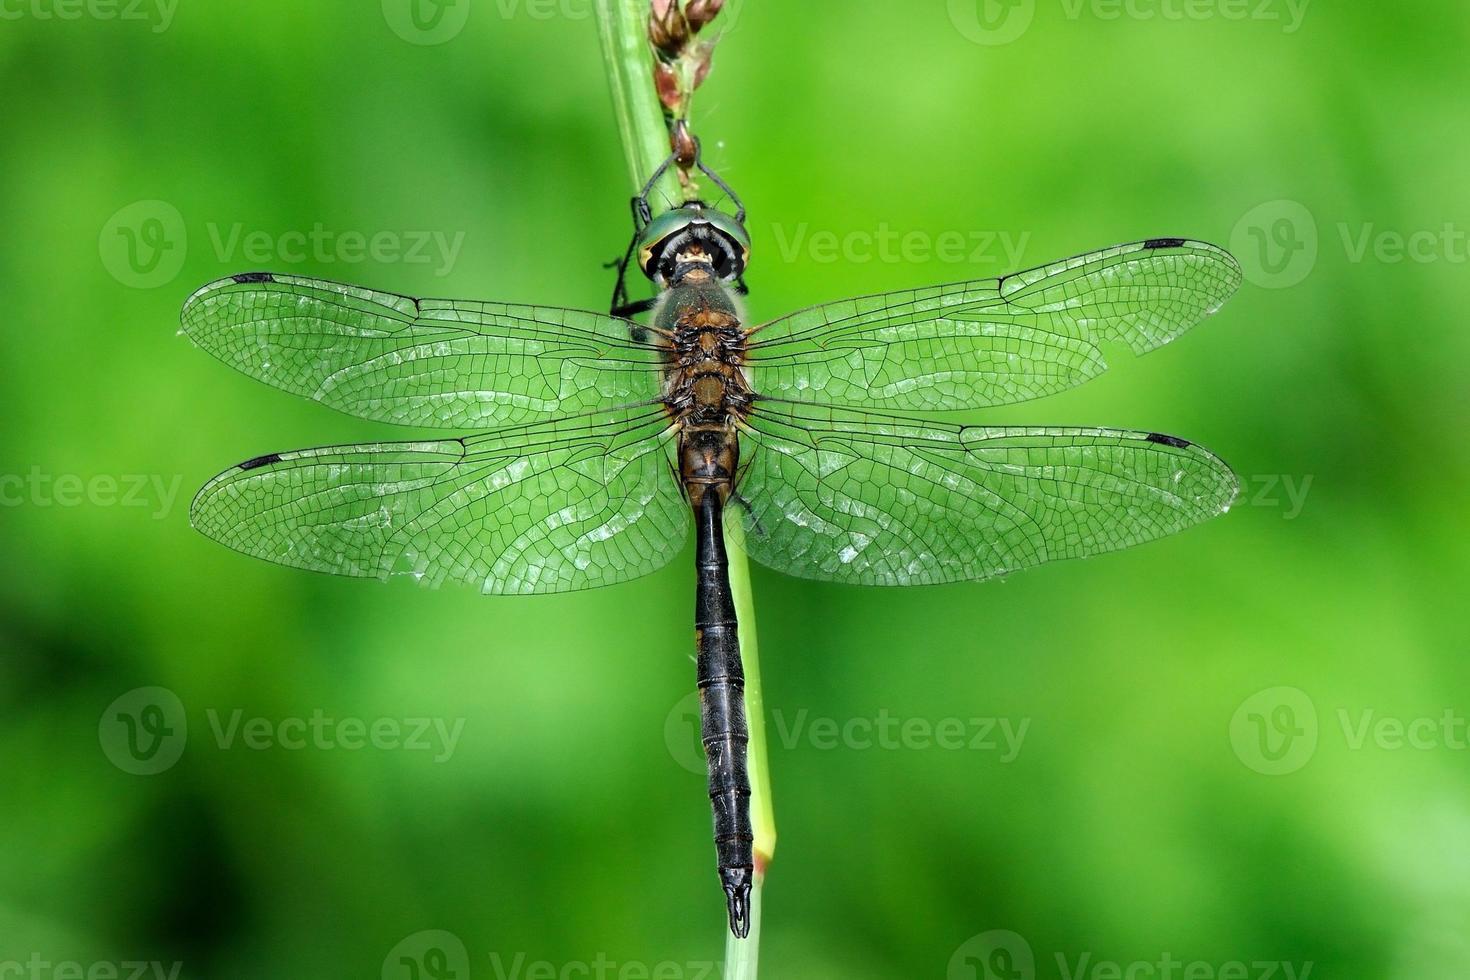 somathoclora flavomaculata, hane foto